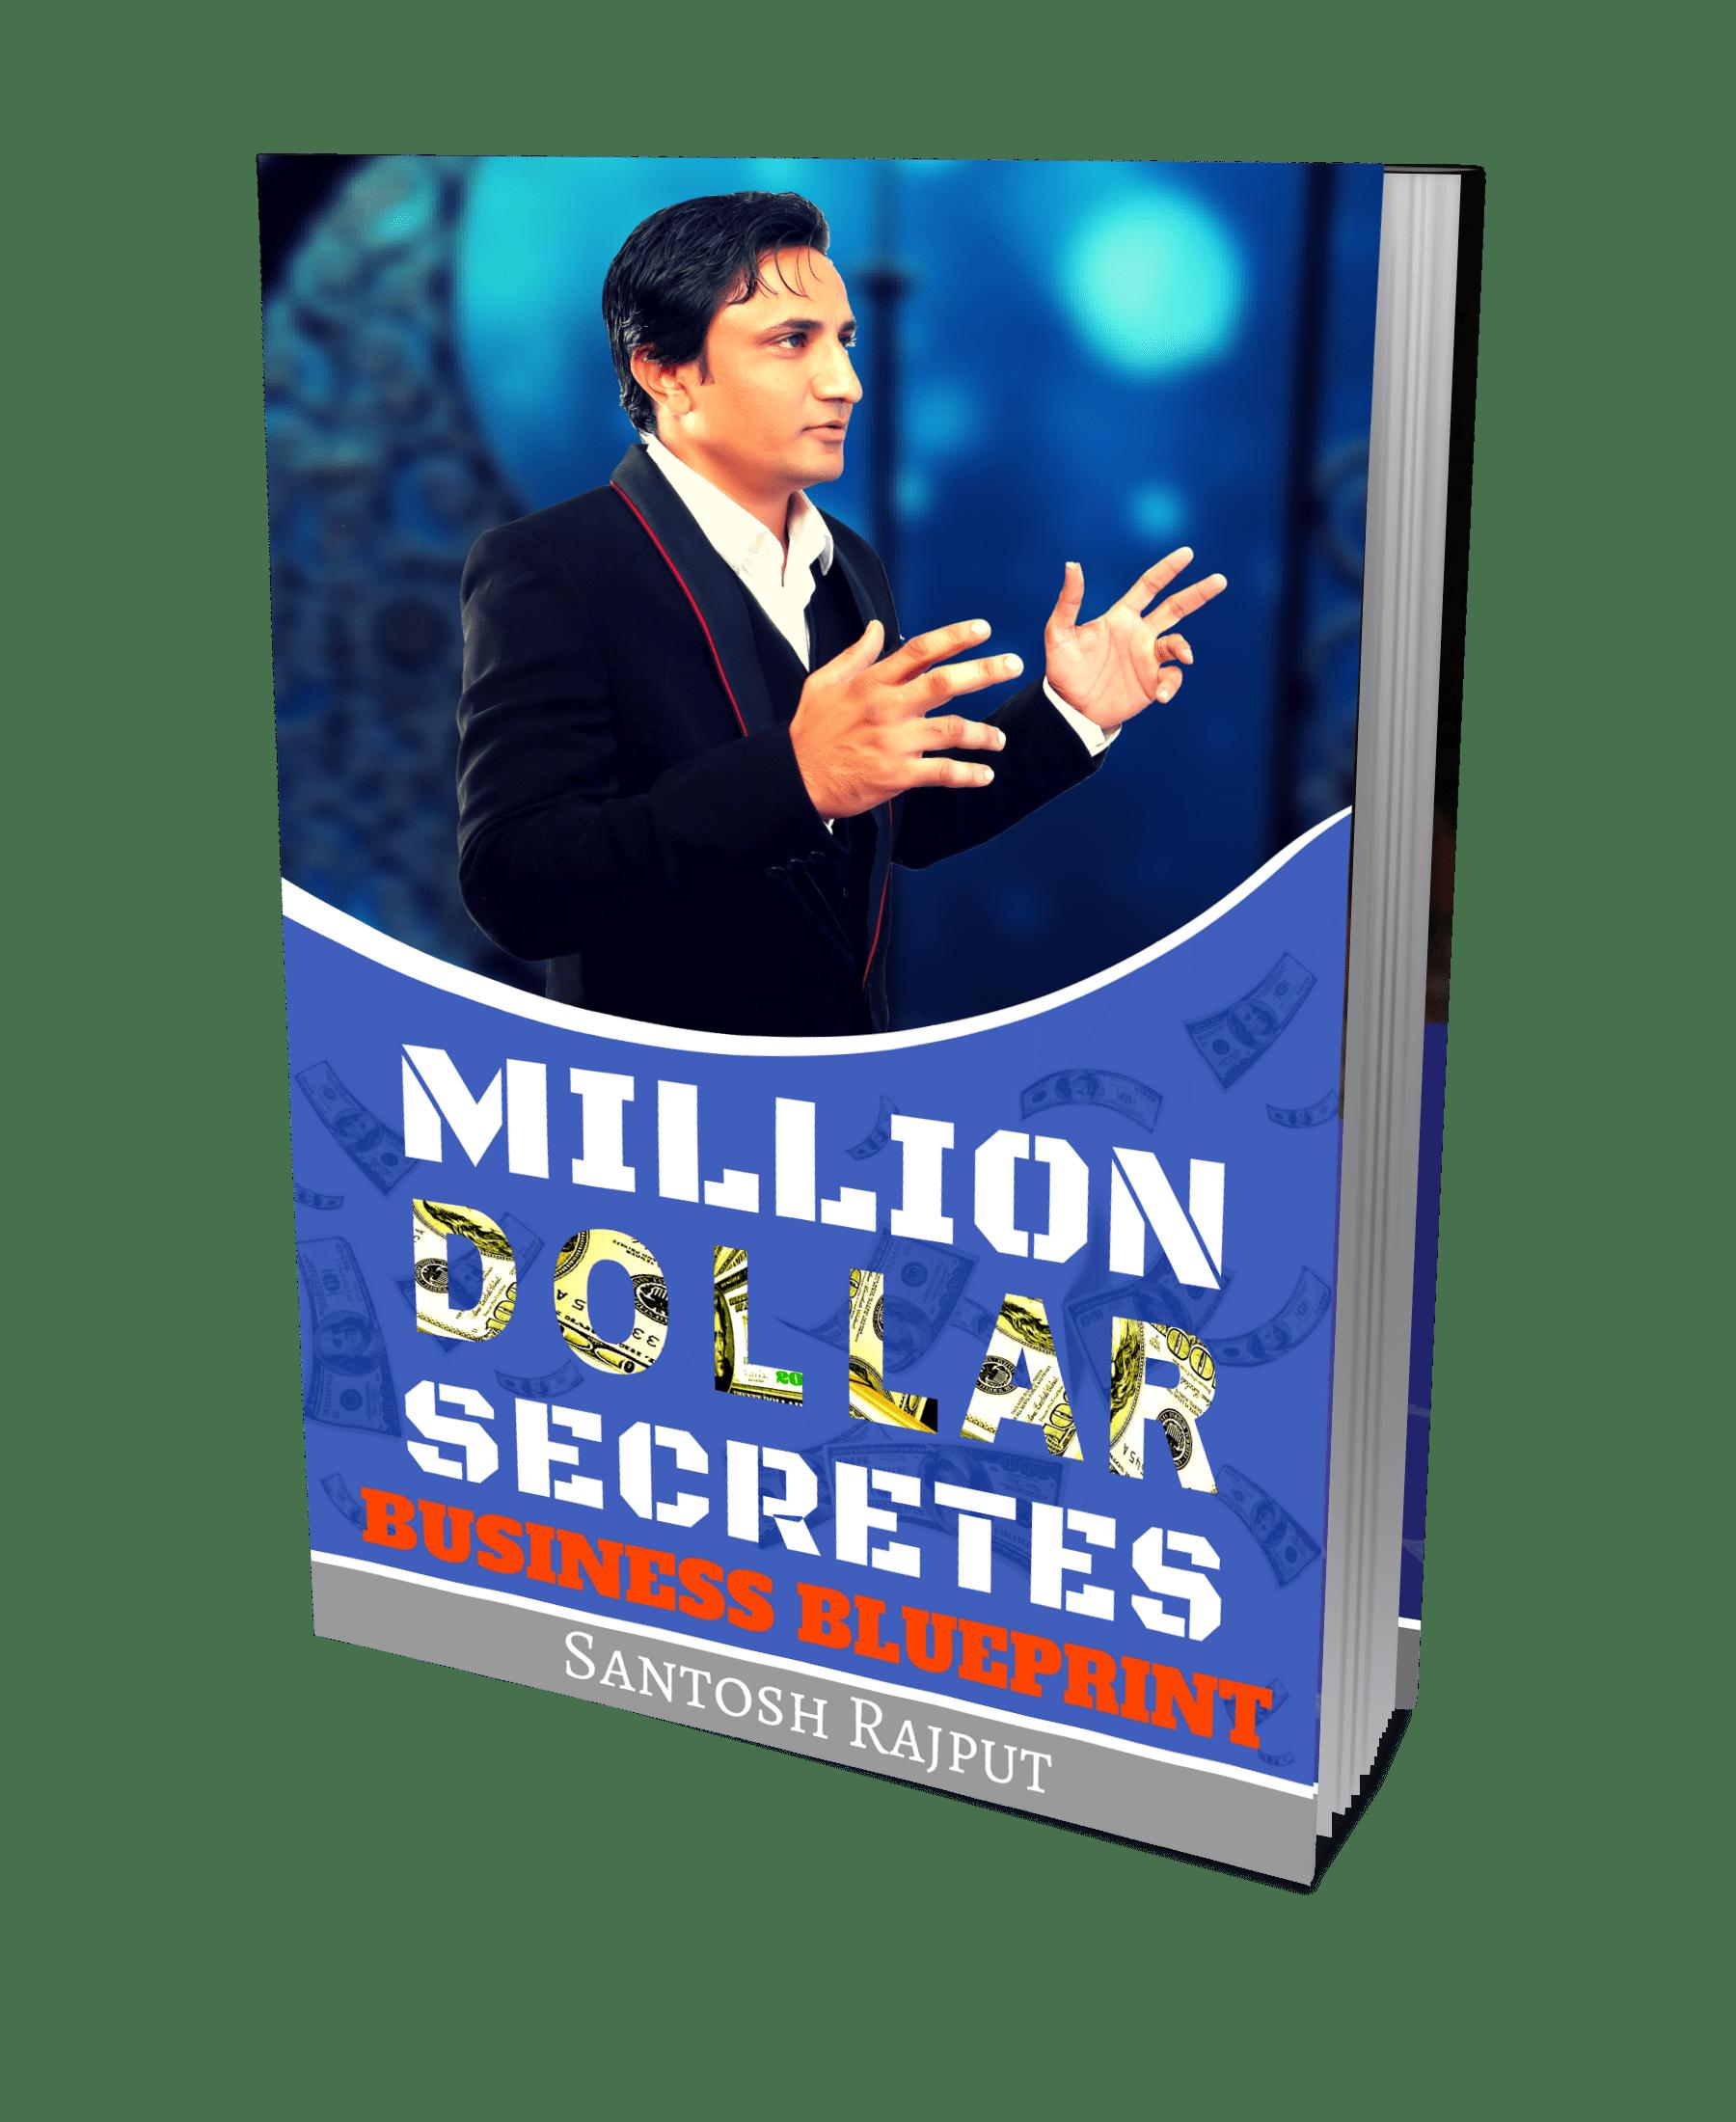 Download million dollar secretes a business blueprint business million dollar secrets business blueprint malvernweather Images